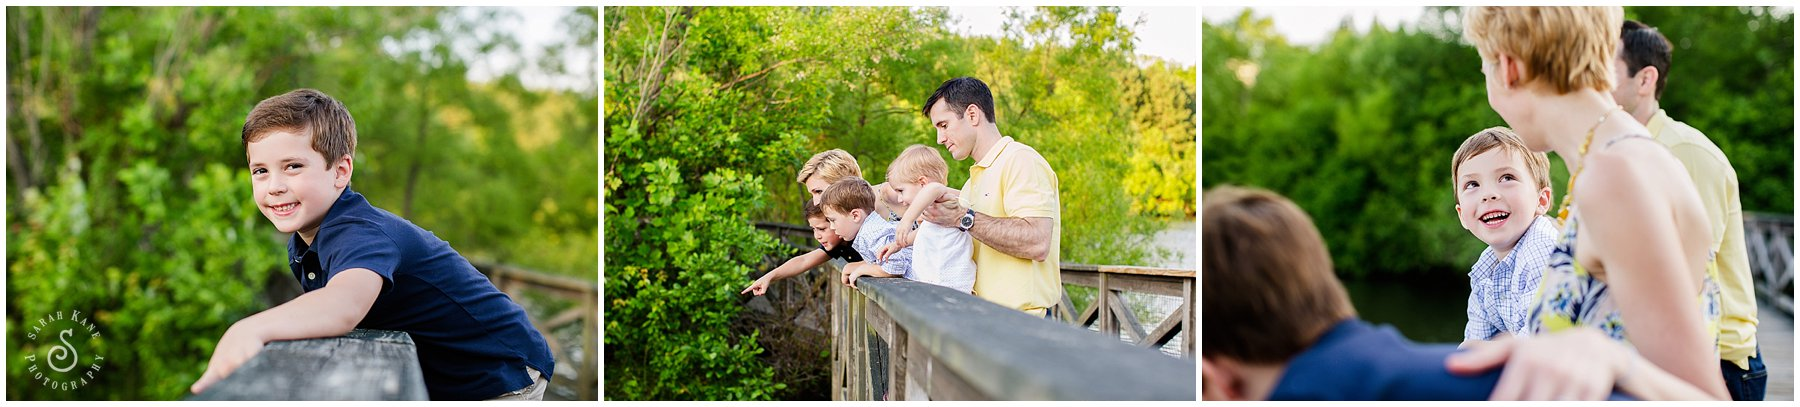 2_Lifestyle Family Portraits 16_ copy.jpg